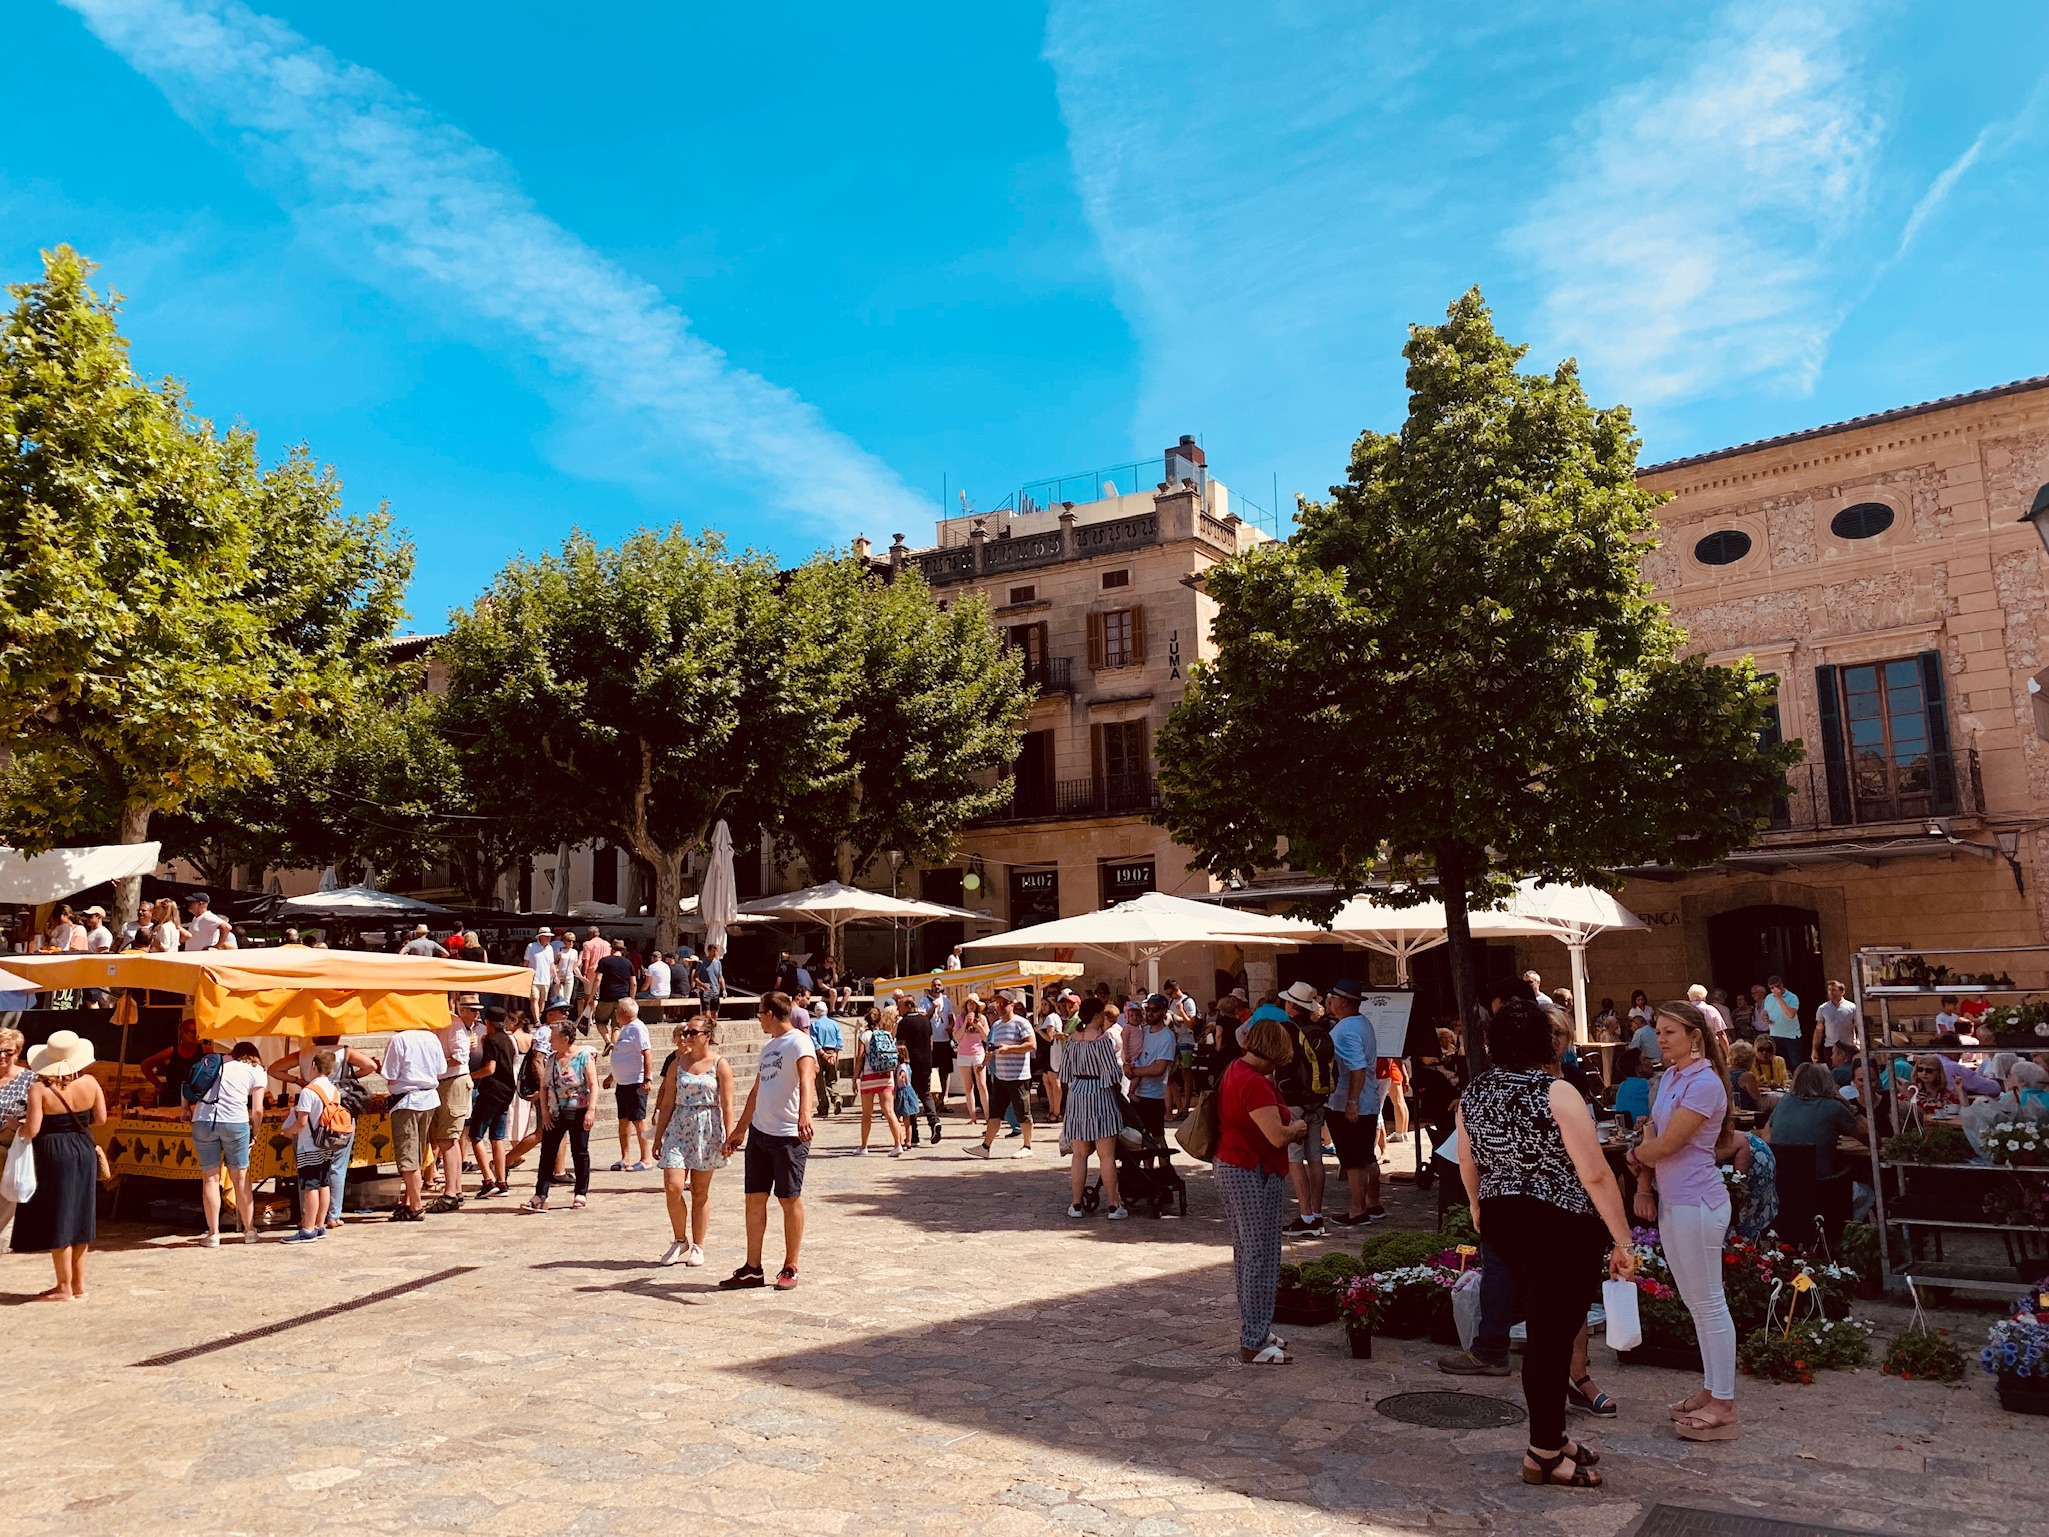 Major Placa Square Pollensa Mallorca